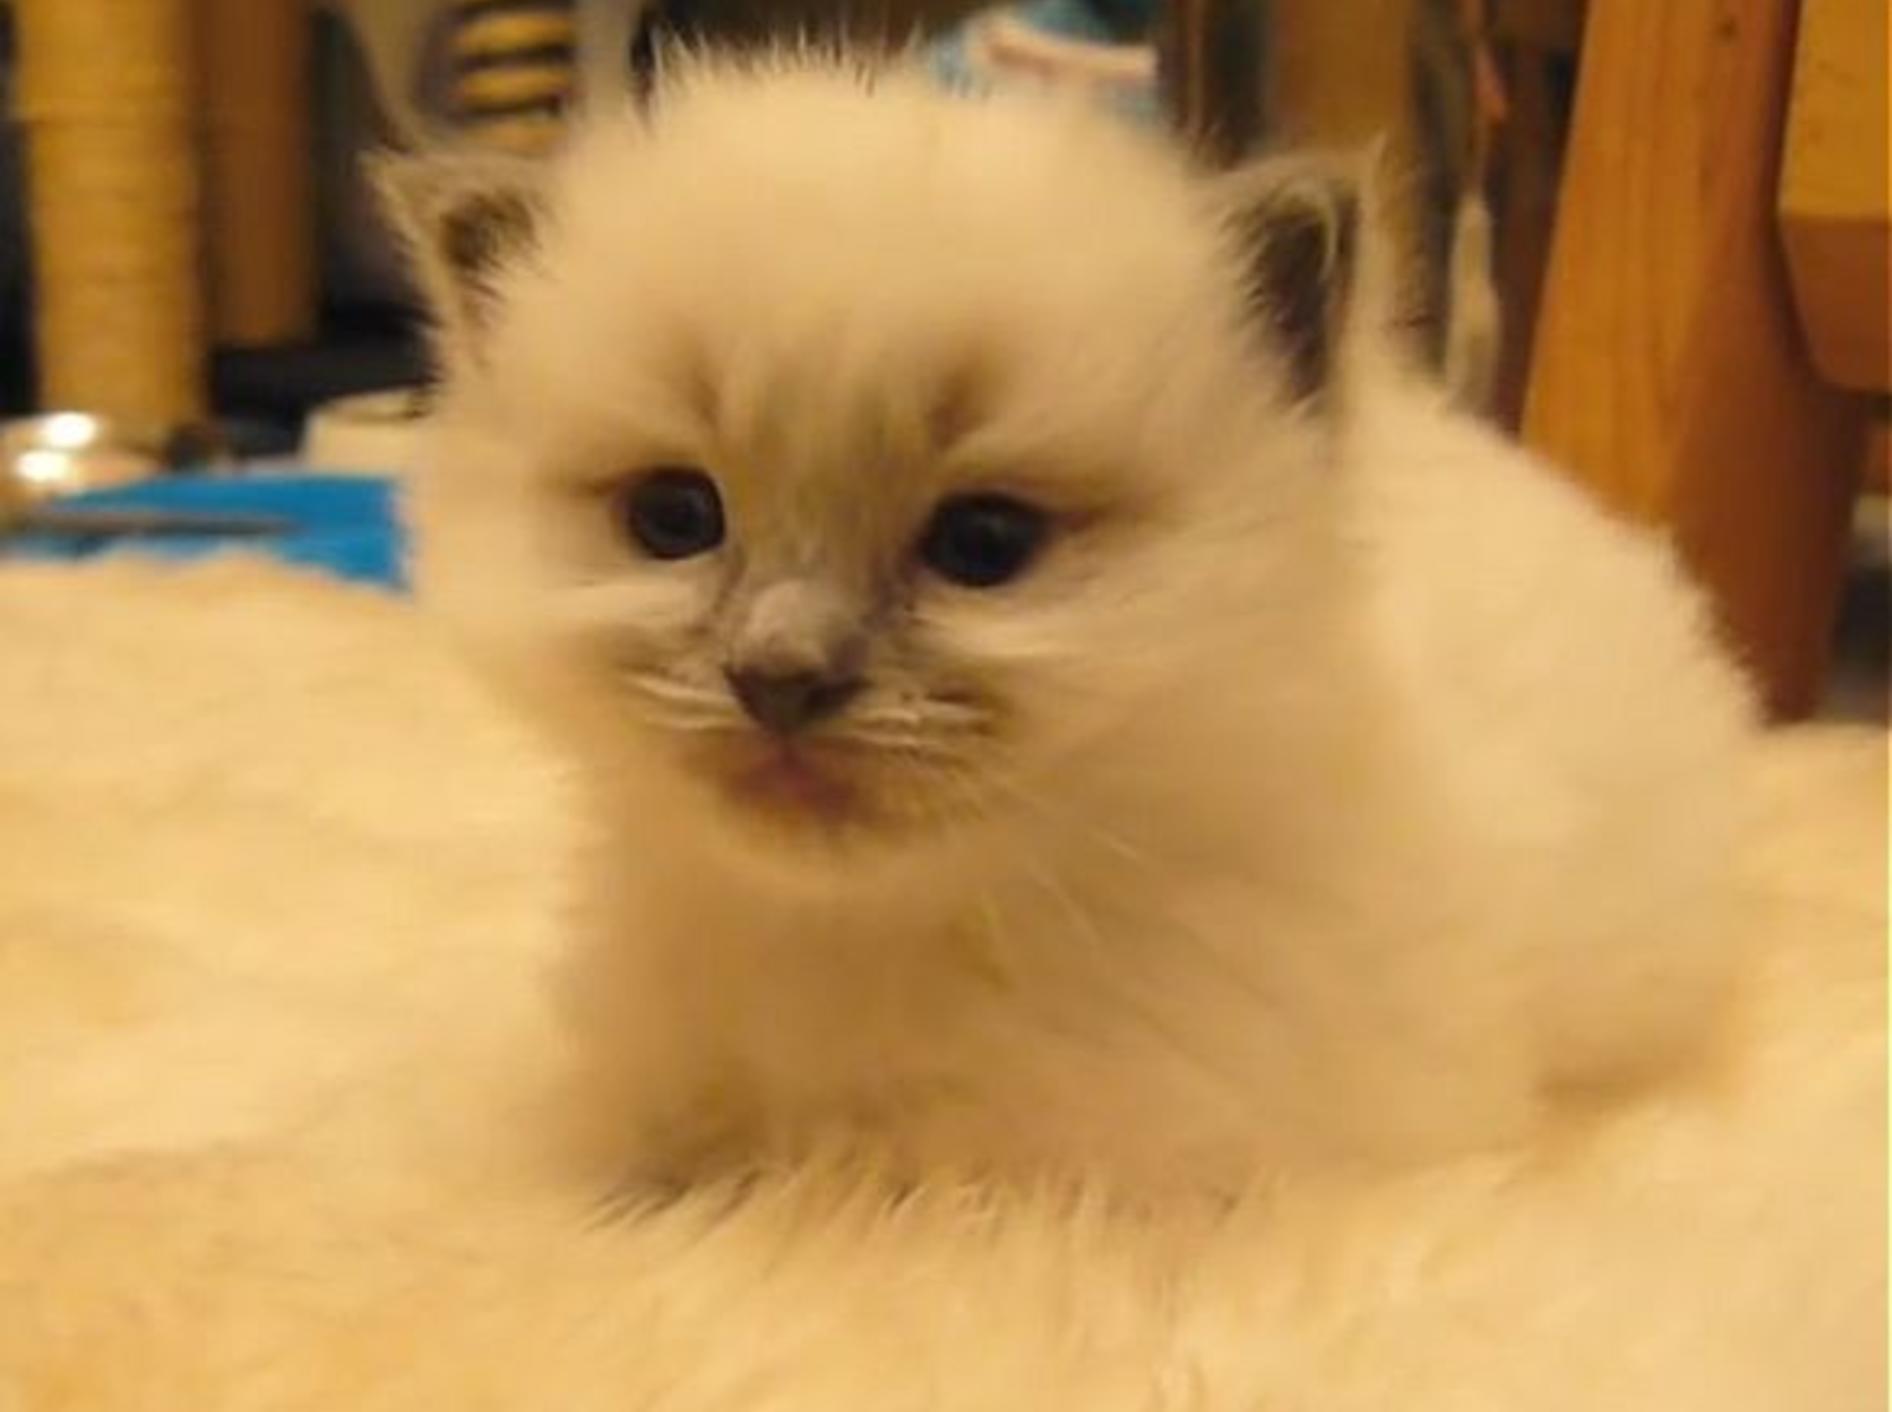 Gute Nacht, flauschiges Katzenbaby! – Bild: Youtube / Chris Fifield-Smith